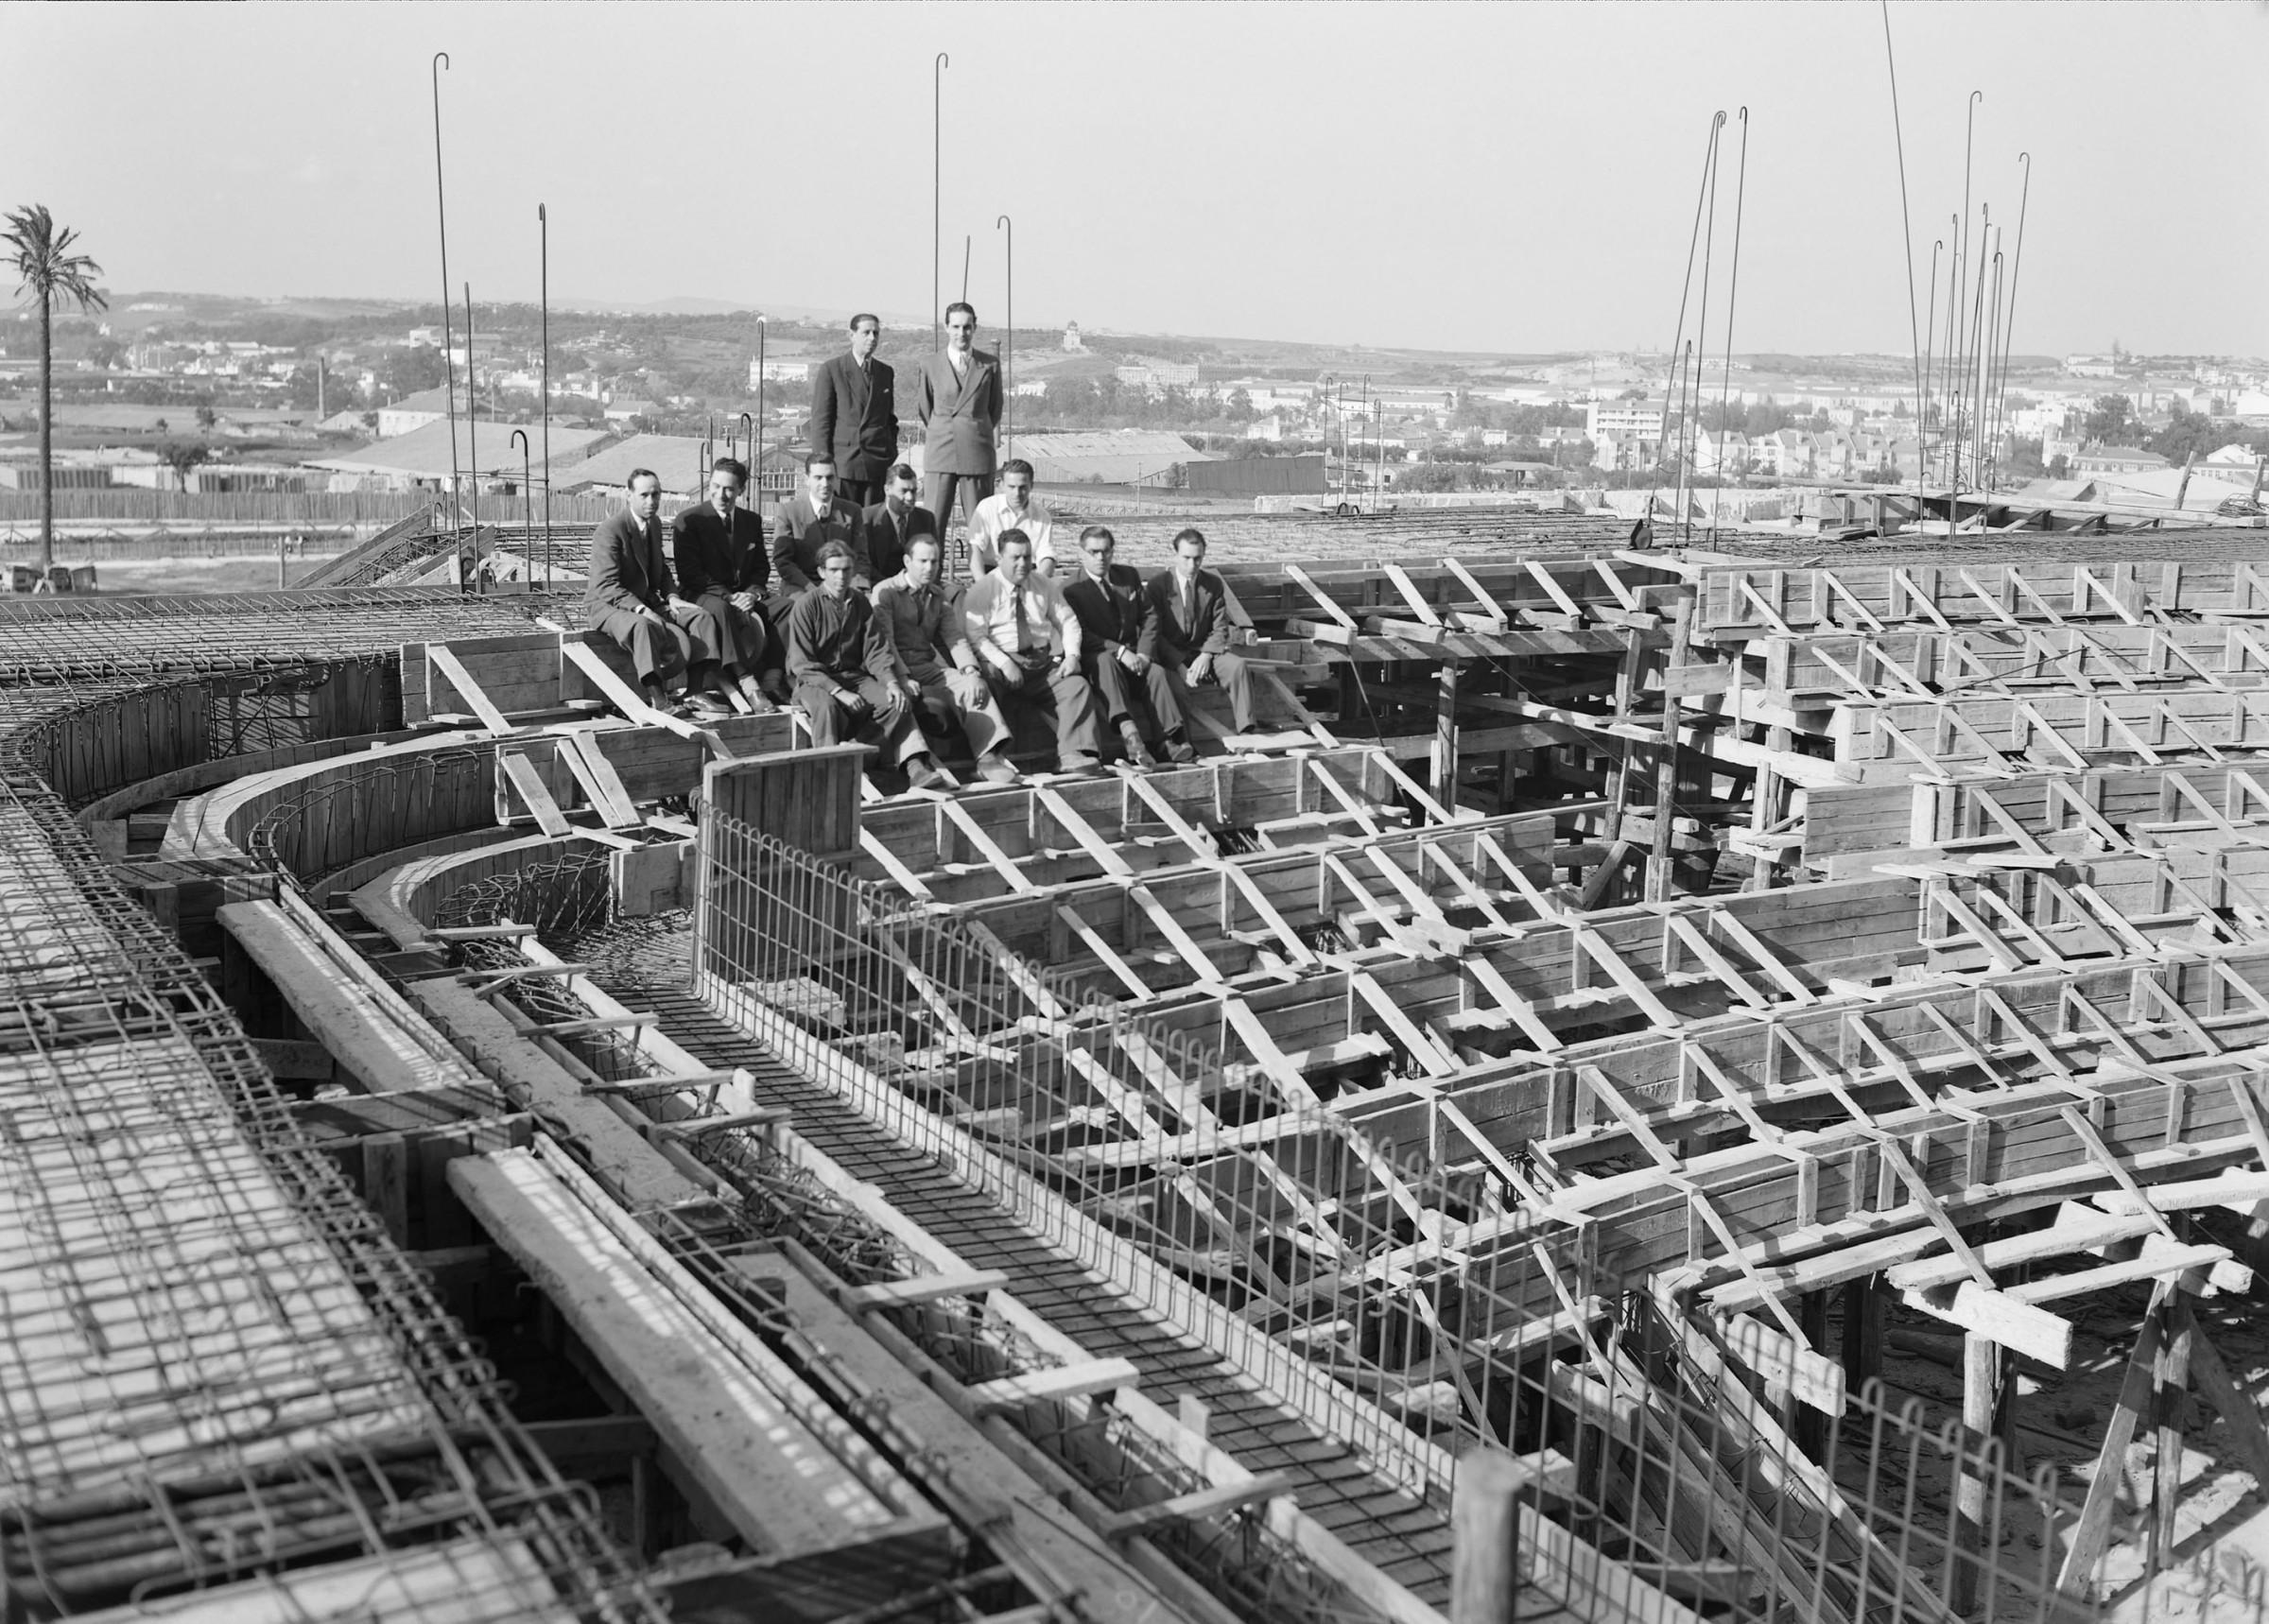 05-construc3a7c3a3o-hsm-aula-magna-1950.jpg